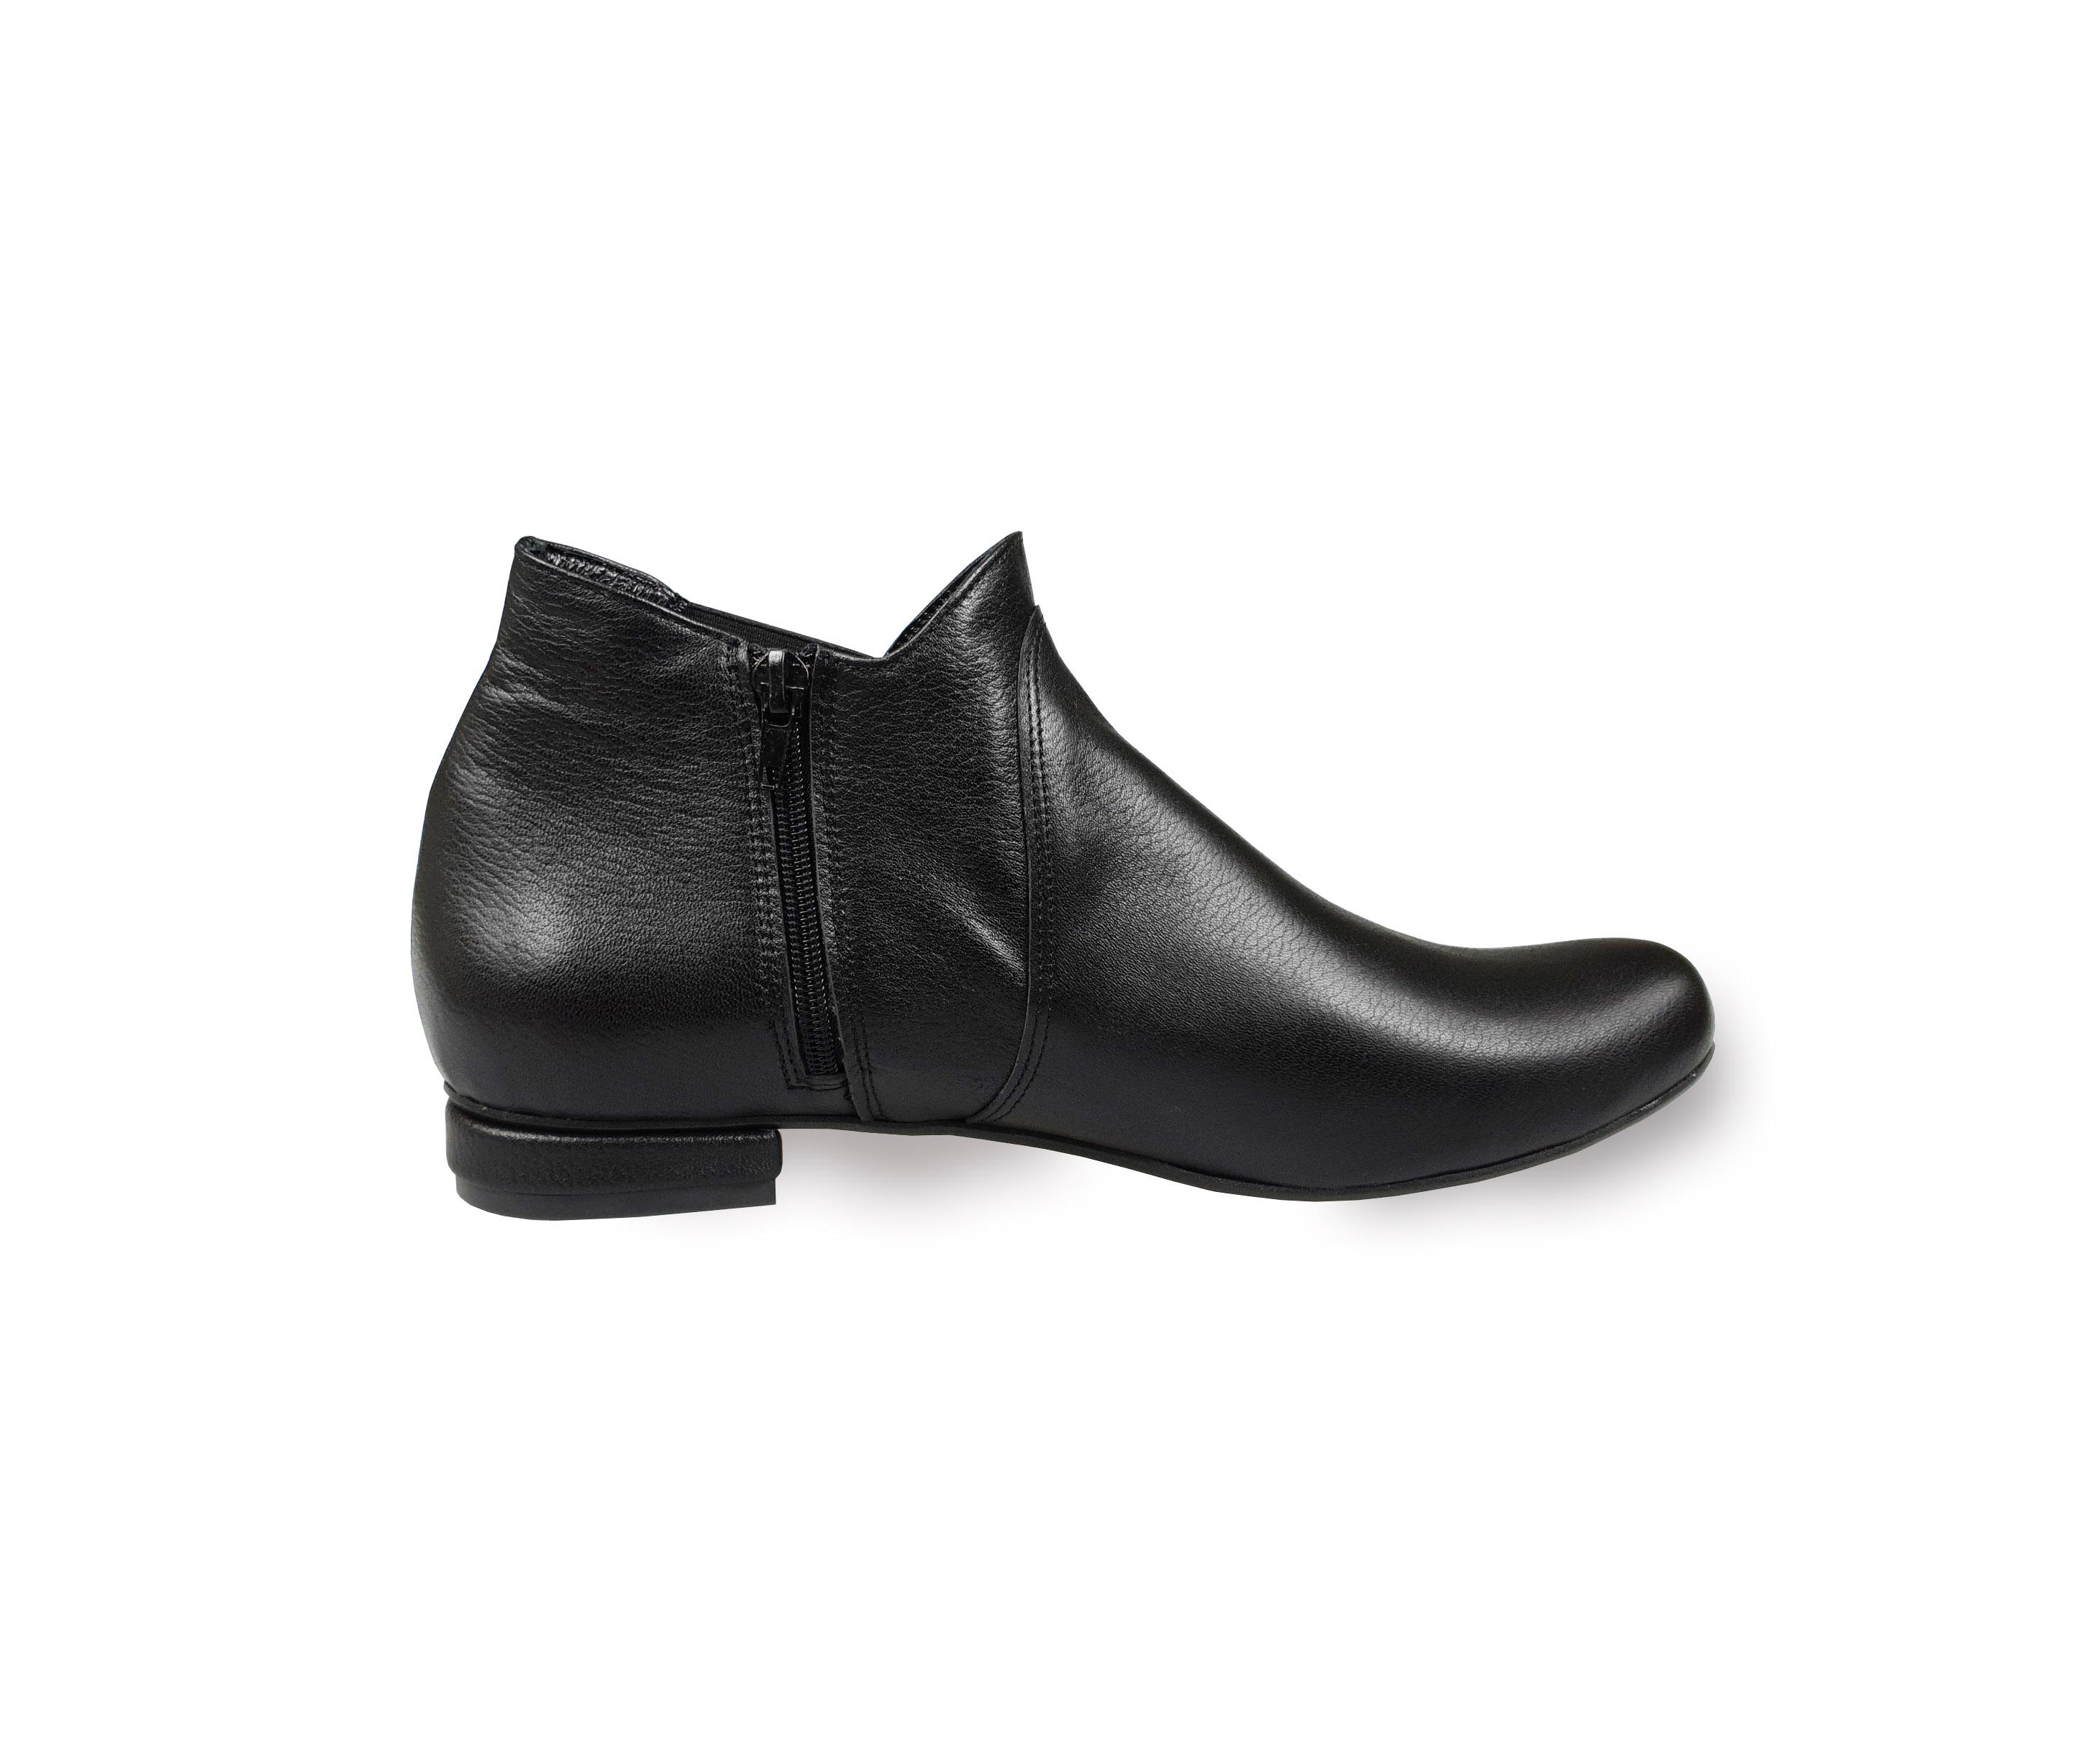 Gabi black leather ankle boots